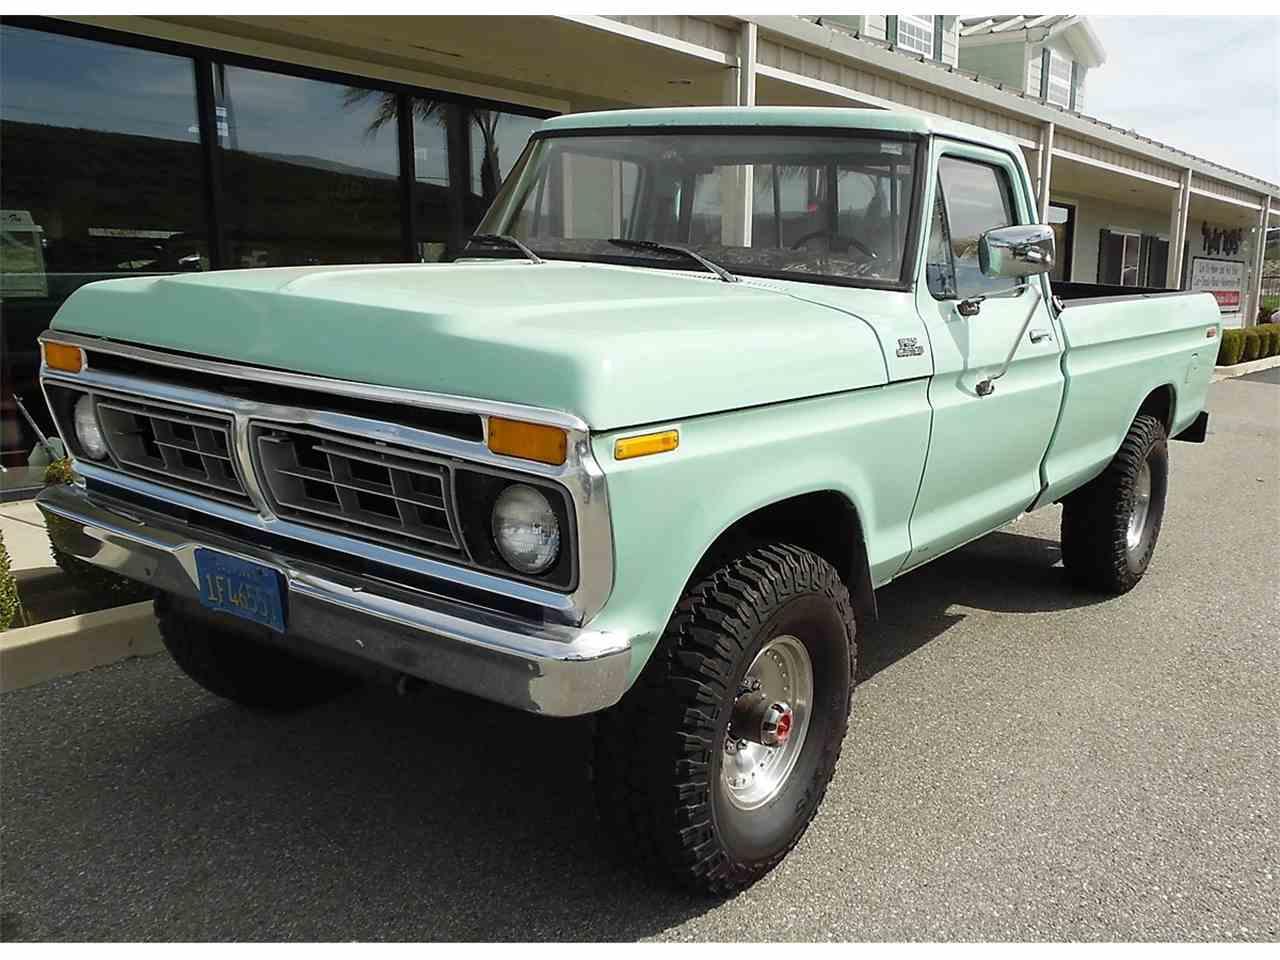 F250 1967 1977 Ford Highboy 2 Available Via Shop The 1969 F 250 4x4 Cc894025 Cc1072861 Cc1042772 400ci Cc1047302 400v8 74819